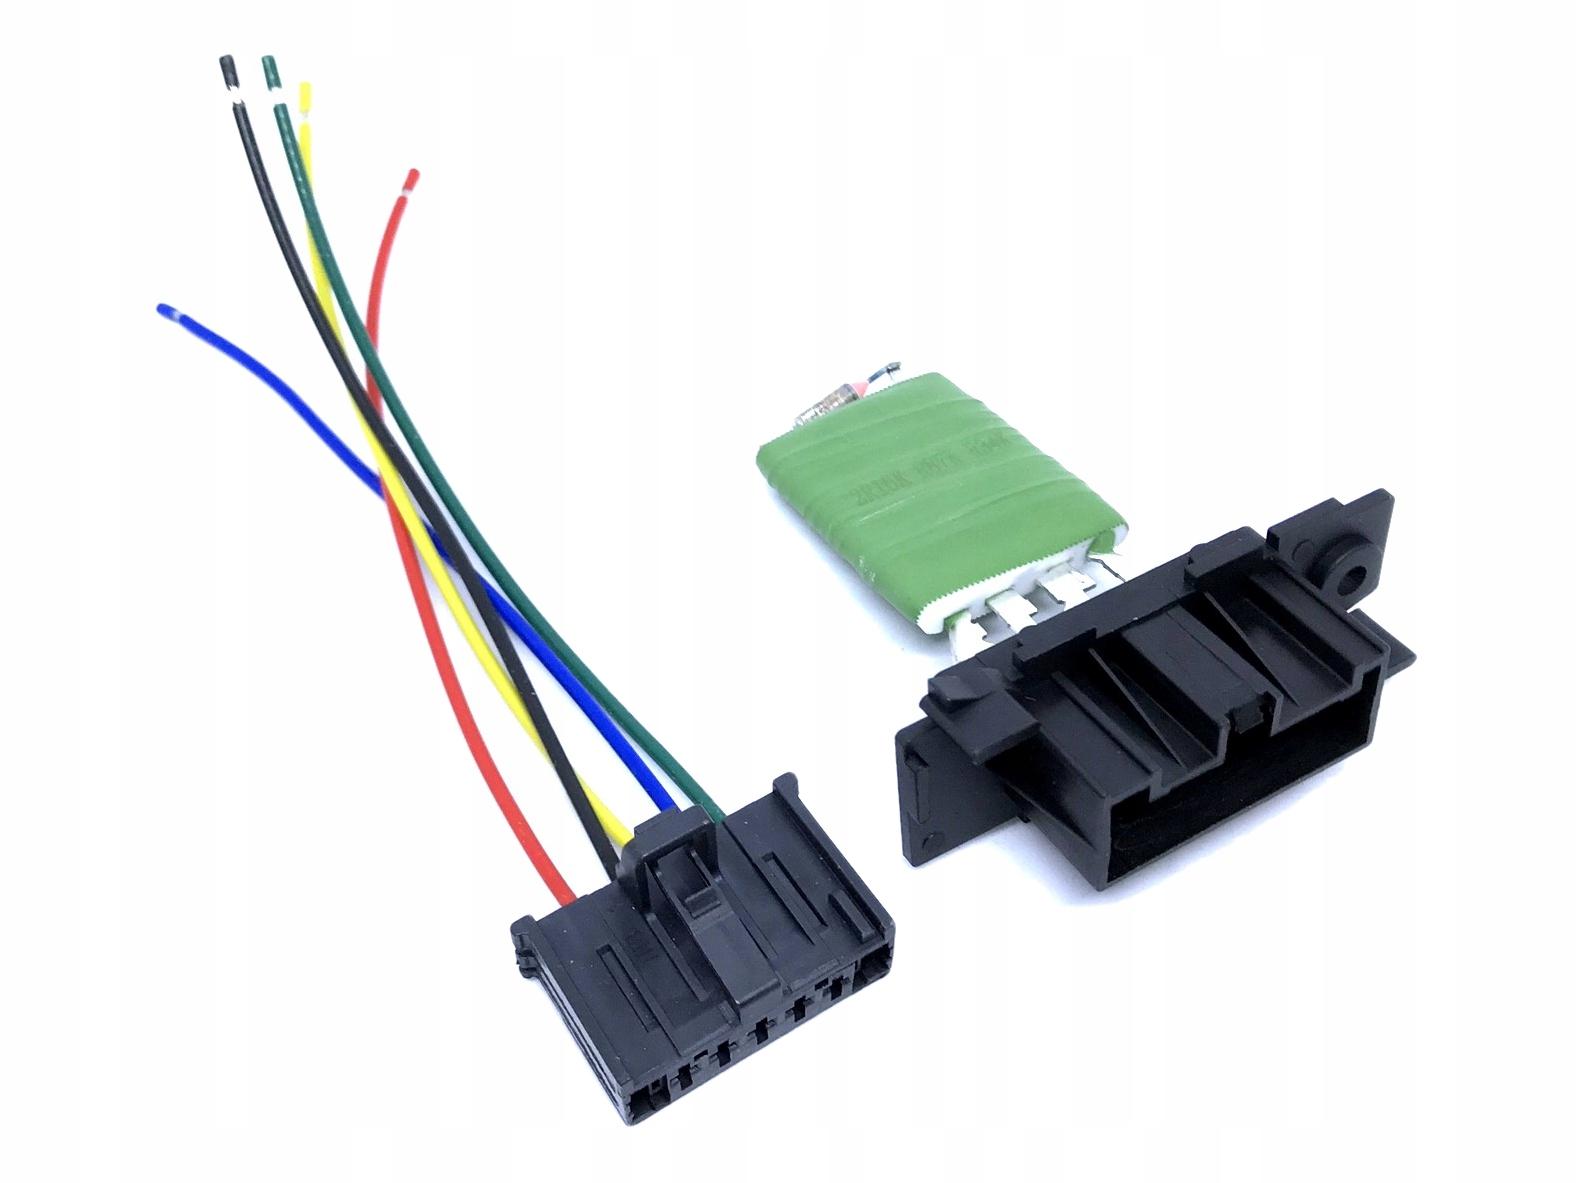 резистор резистор + разъем  ducato boxer jumper 06-